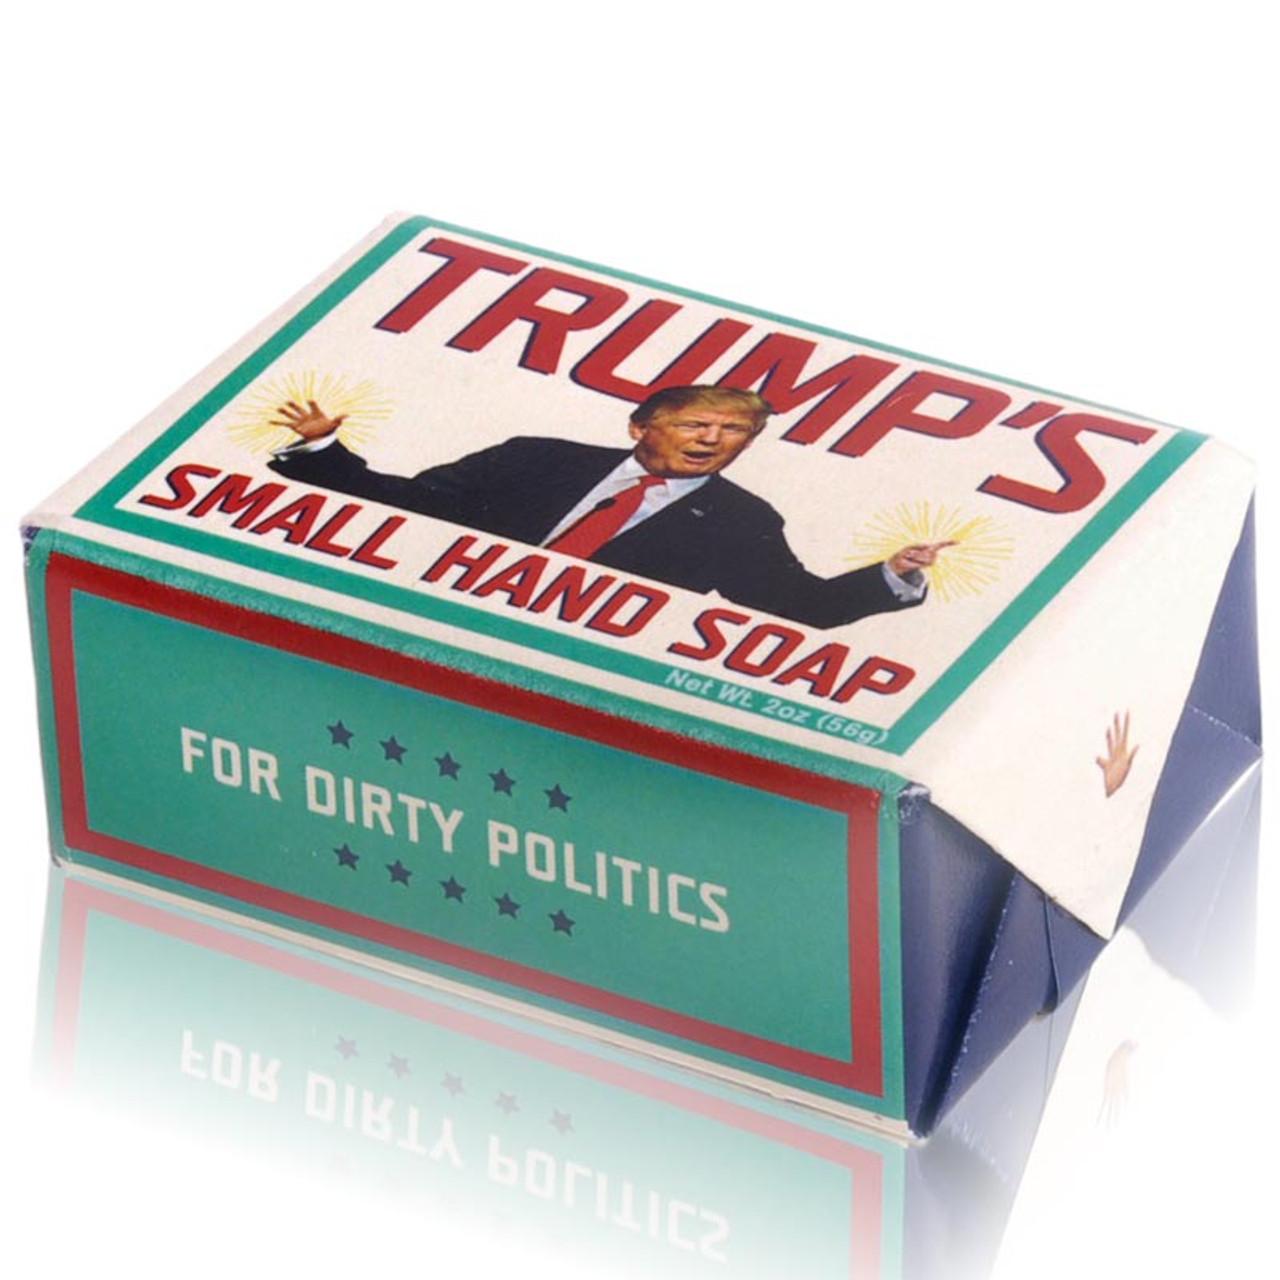 Donald Trump Small Hand Soap Stocking Stuffer